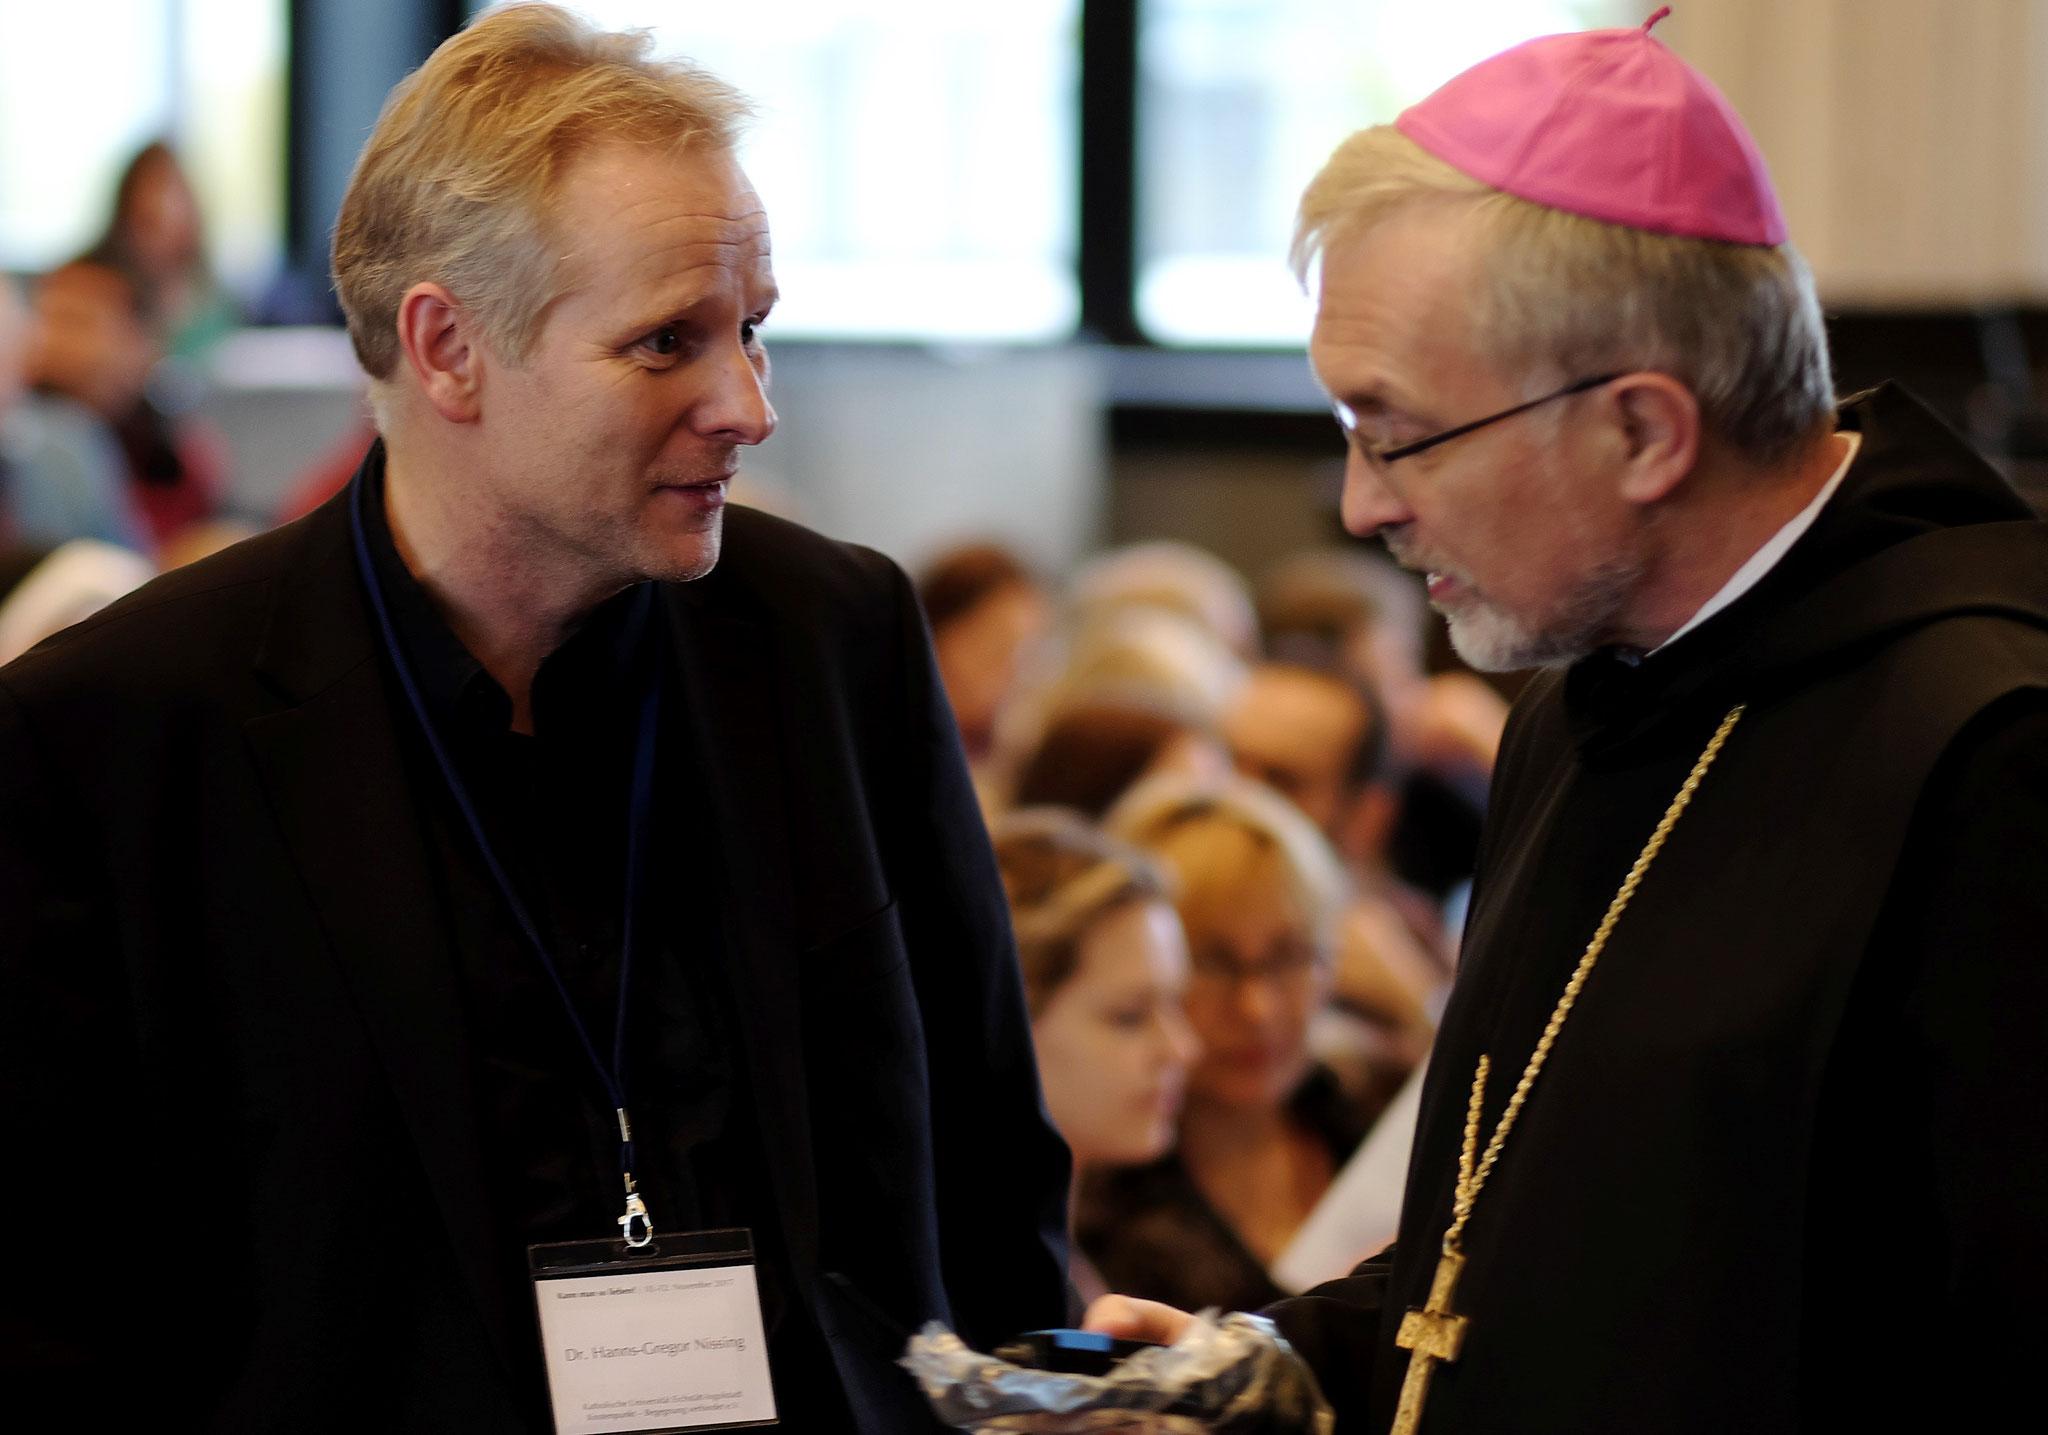 Dr. Hanns-Gregor Nissing, Bischof Gregor Maria Hanke